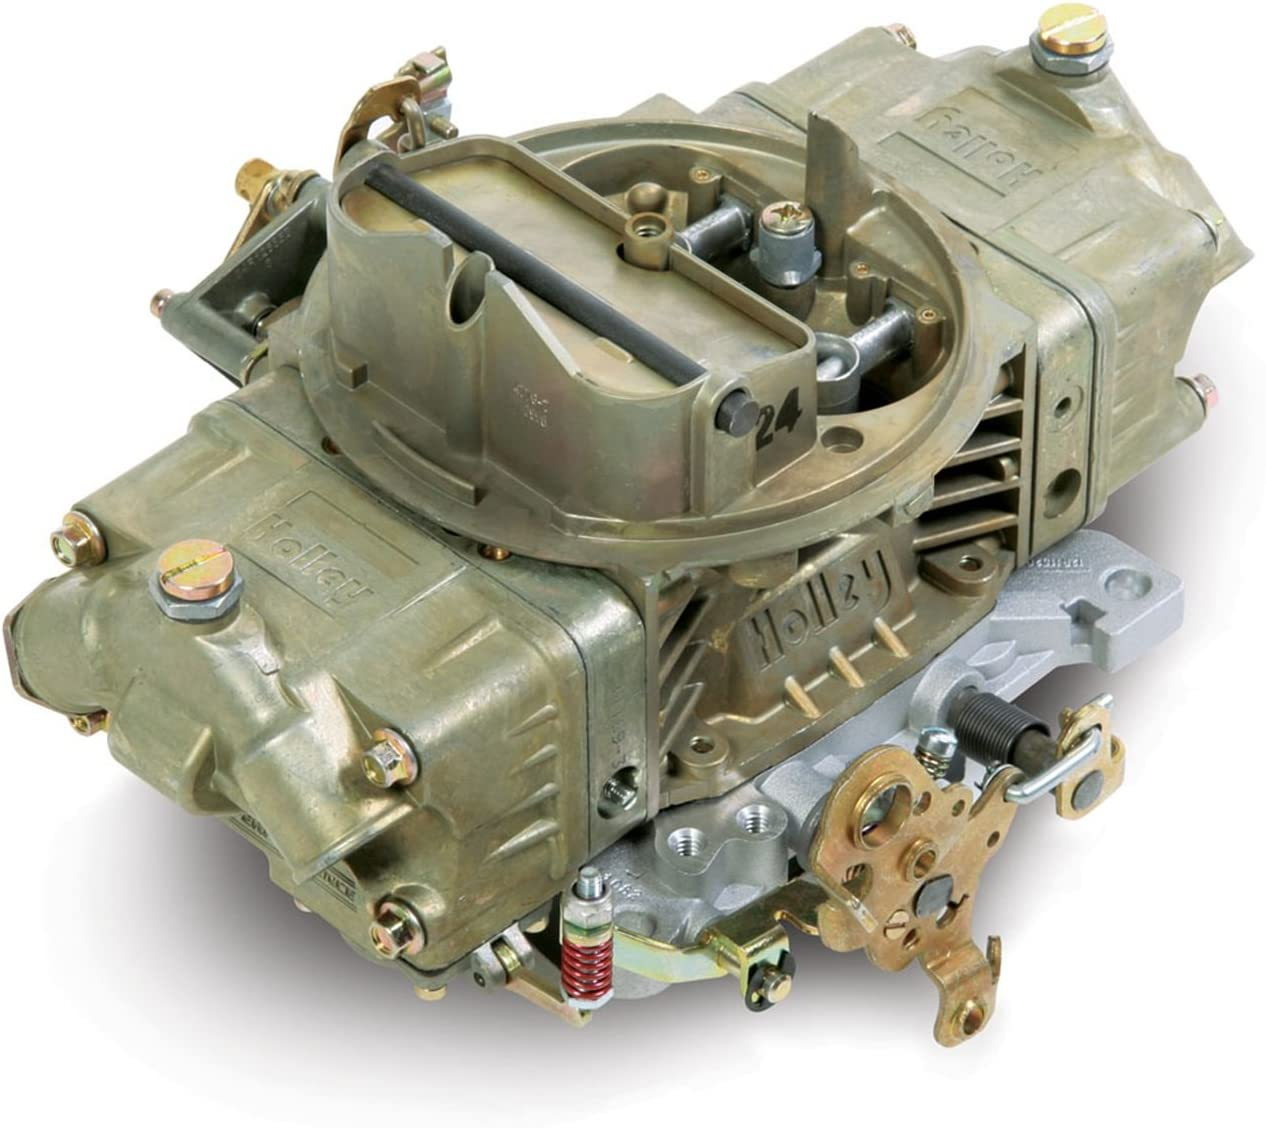 B00029J4G0 Holley 0-4776C Model 4150 Double Pumper 600 CFM Square Bore 4-Barrel Mechanical Secondary Manual Choke New Carburetor 71SJmIRwOuL.SL1500_